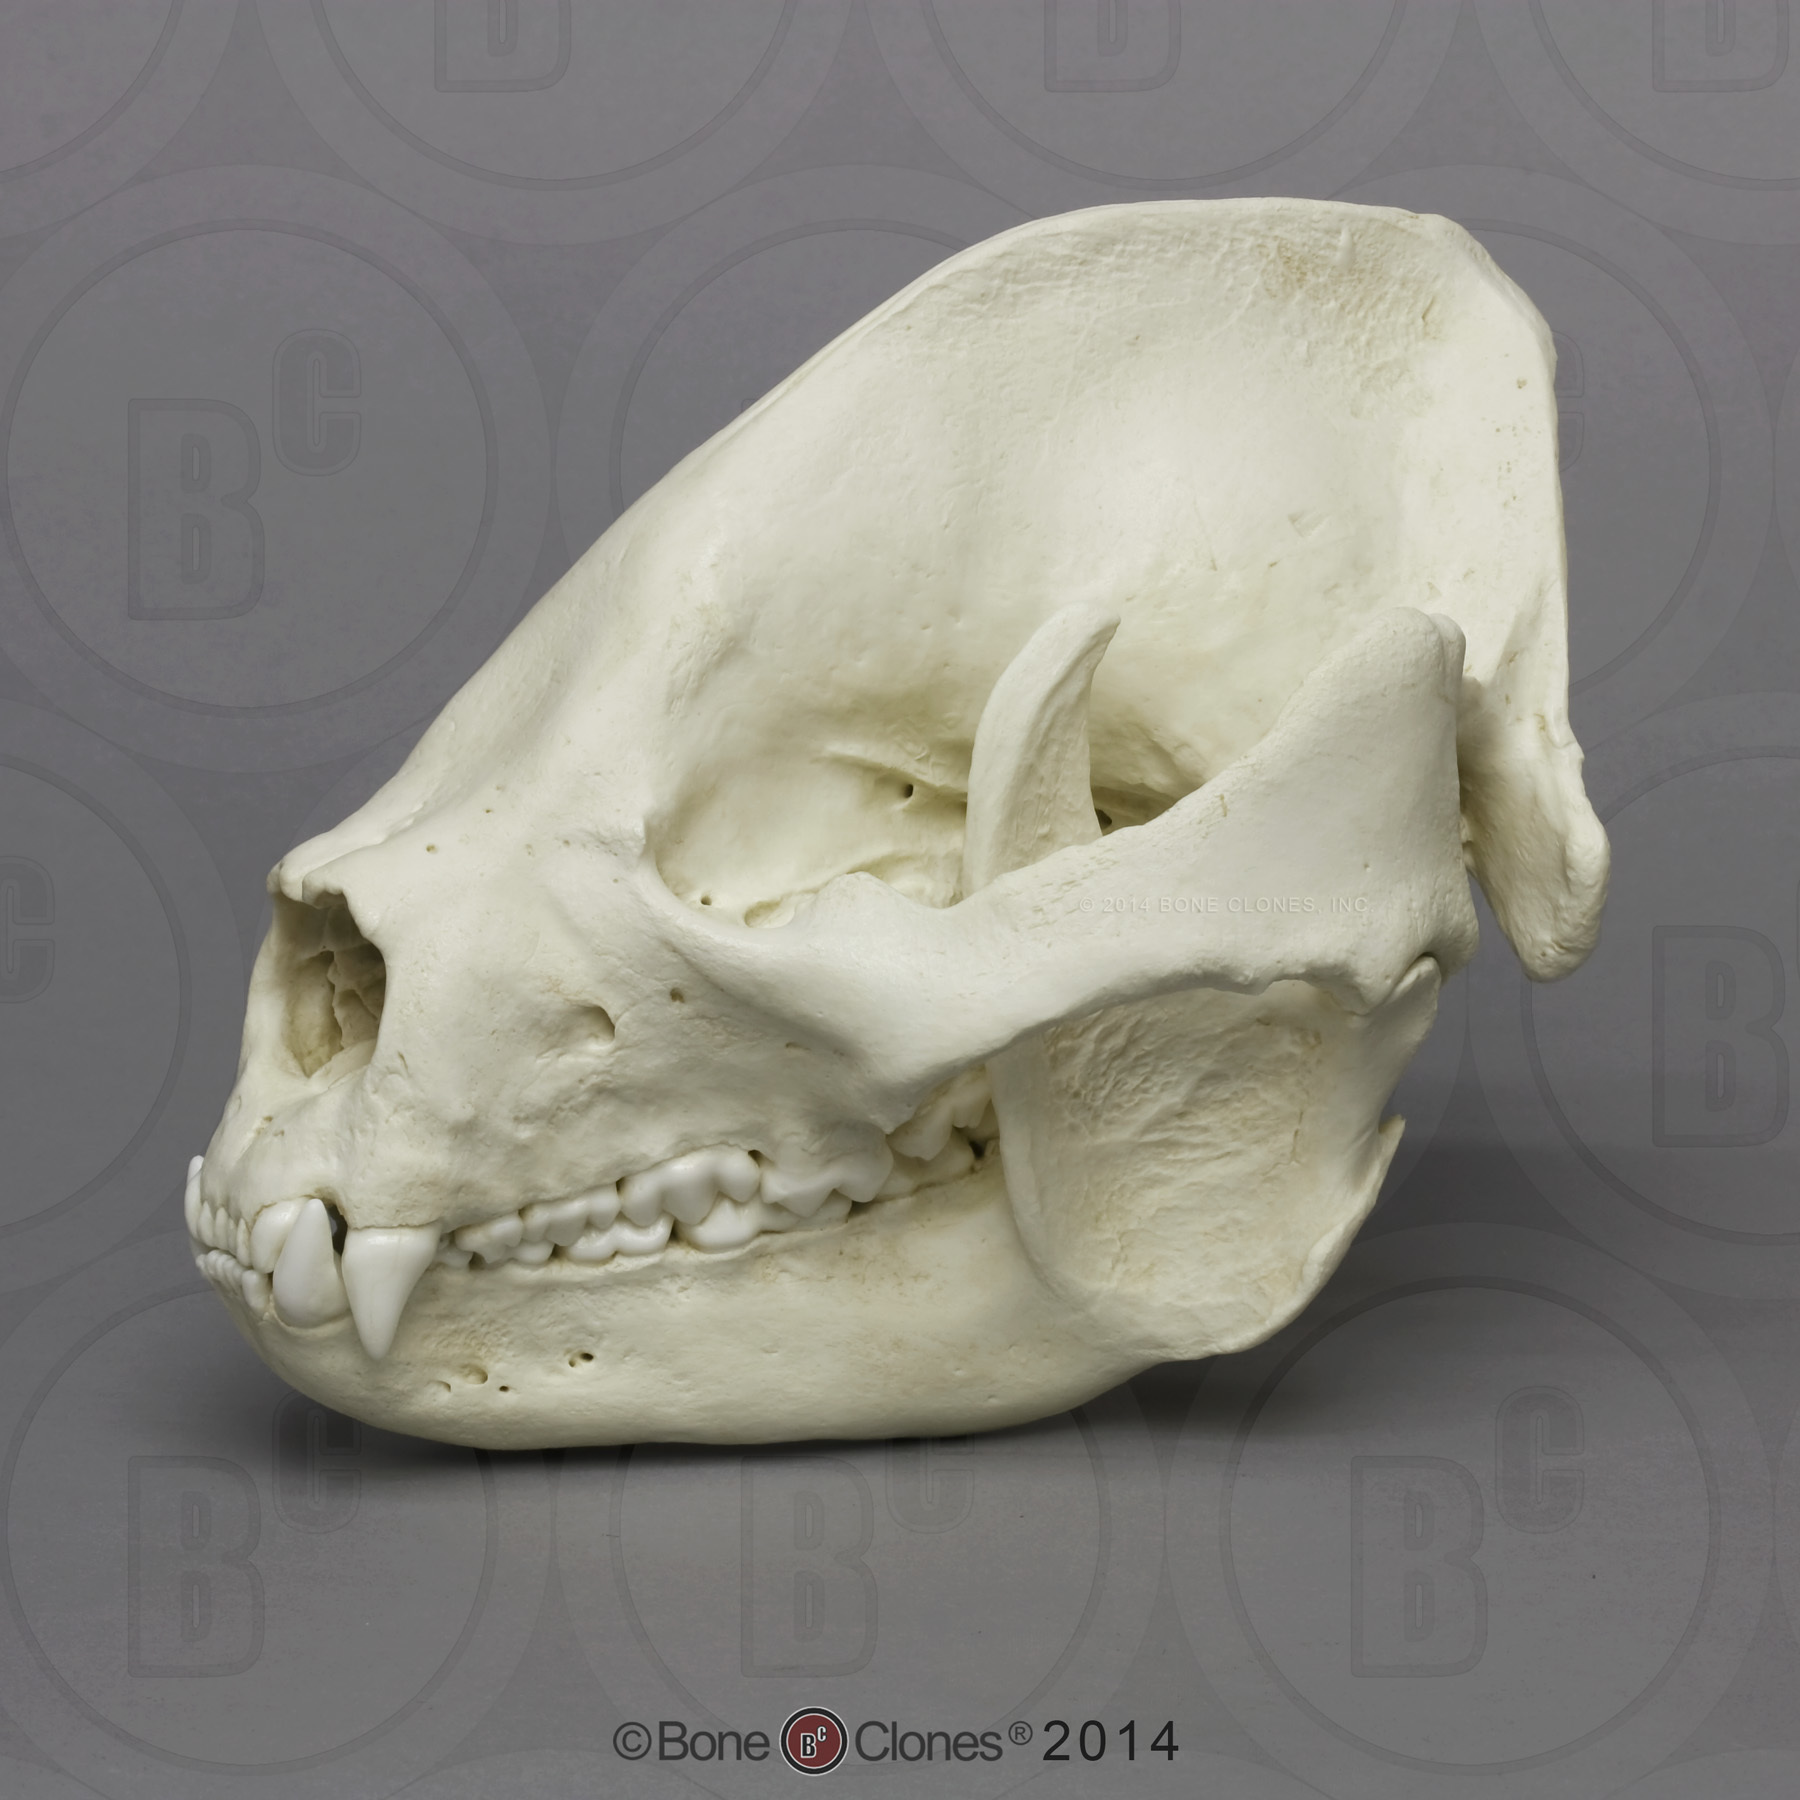 Bear Skulls - Bone Clones, Inc. - Osteological Reproductions